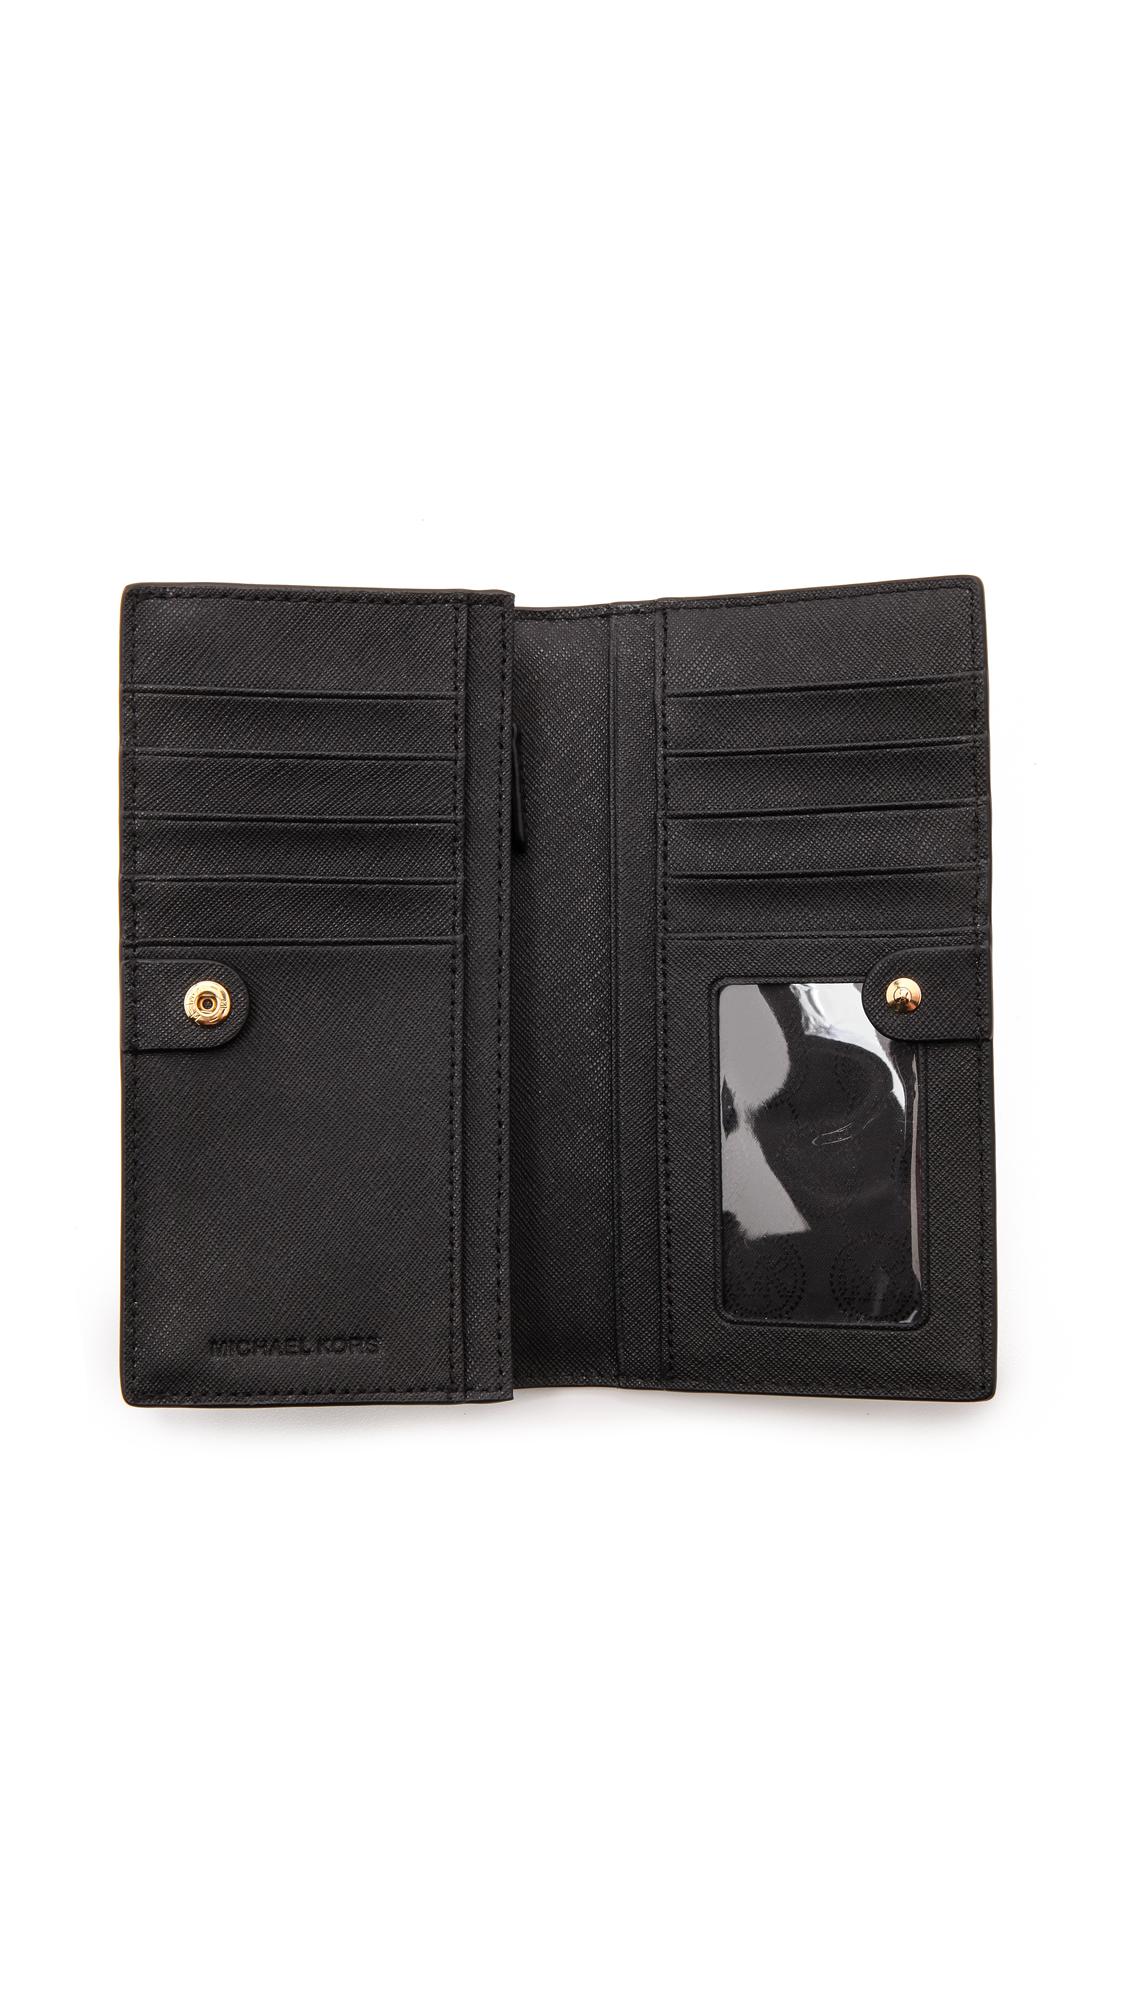 277c9abdcb95cd MICHAEL Michael Kors Jet Set Travel Large Slim Wallet in Black - Lyst